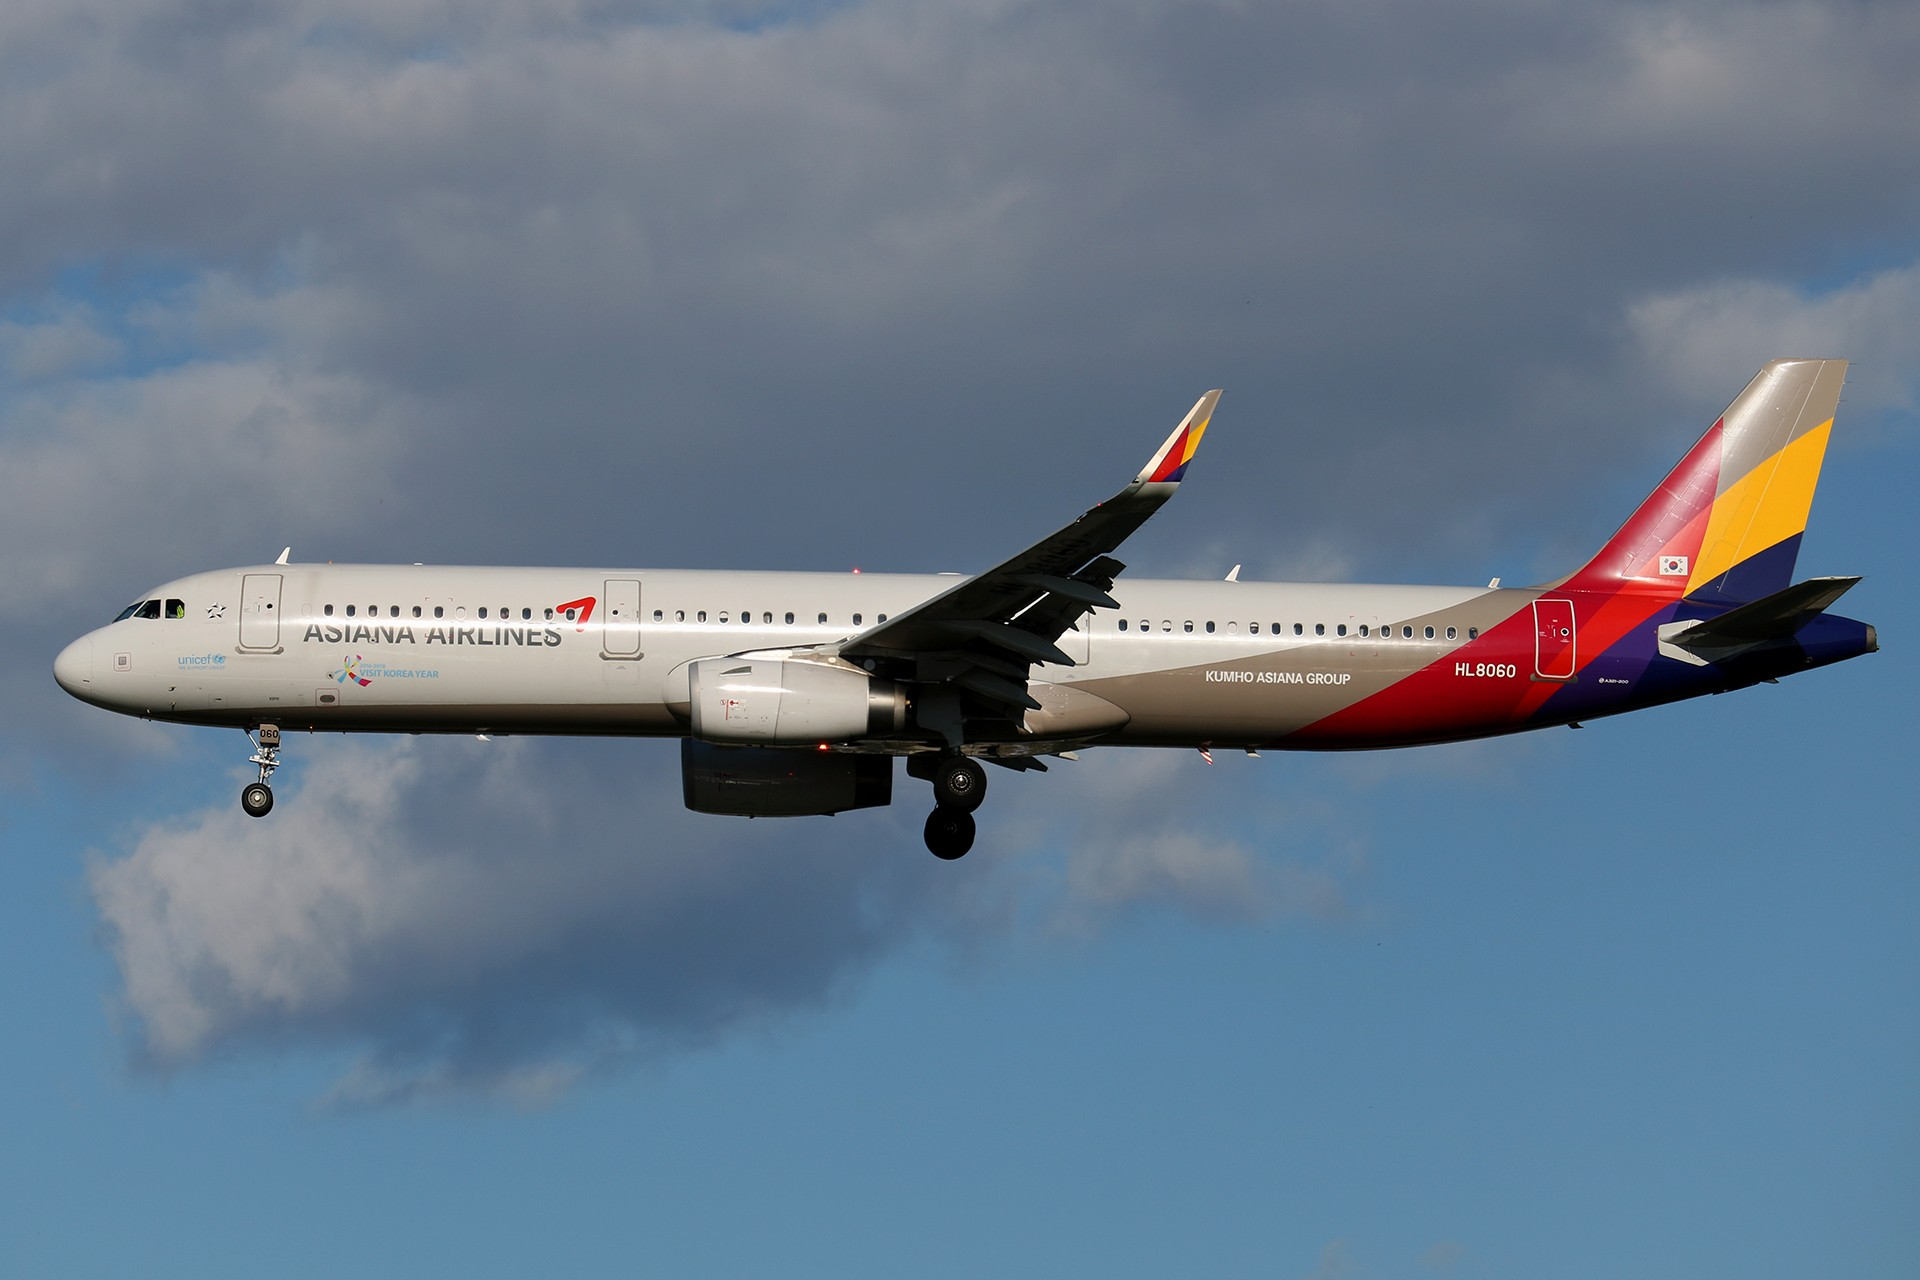 Re:[原创]LIULIU 【PEK 01】 好看的云Ⅳ 杂,很杂,是真的杂 AIRBUS A321-231 HL8060 中国北京首都国际机场